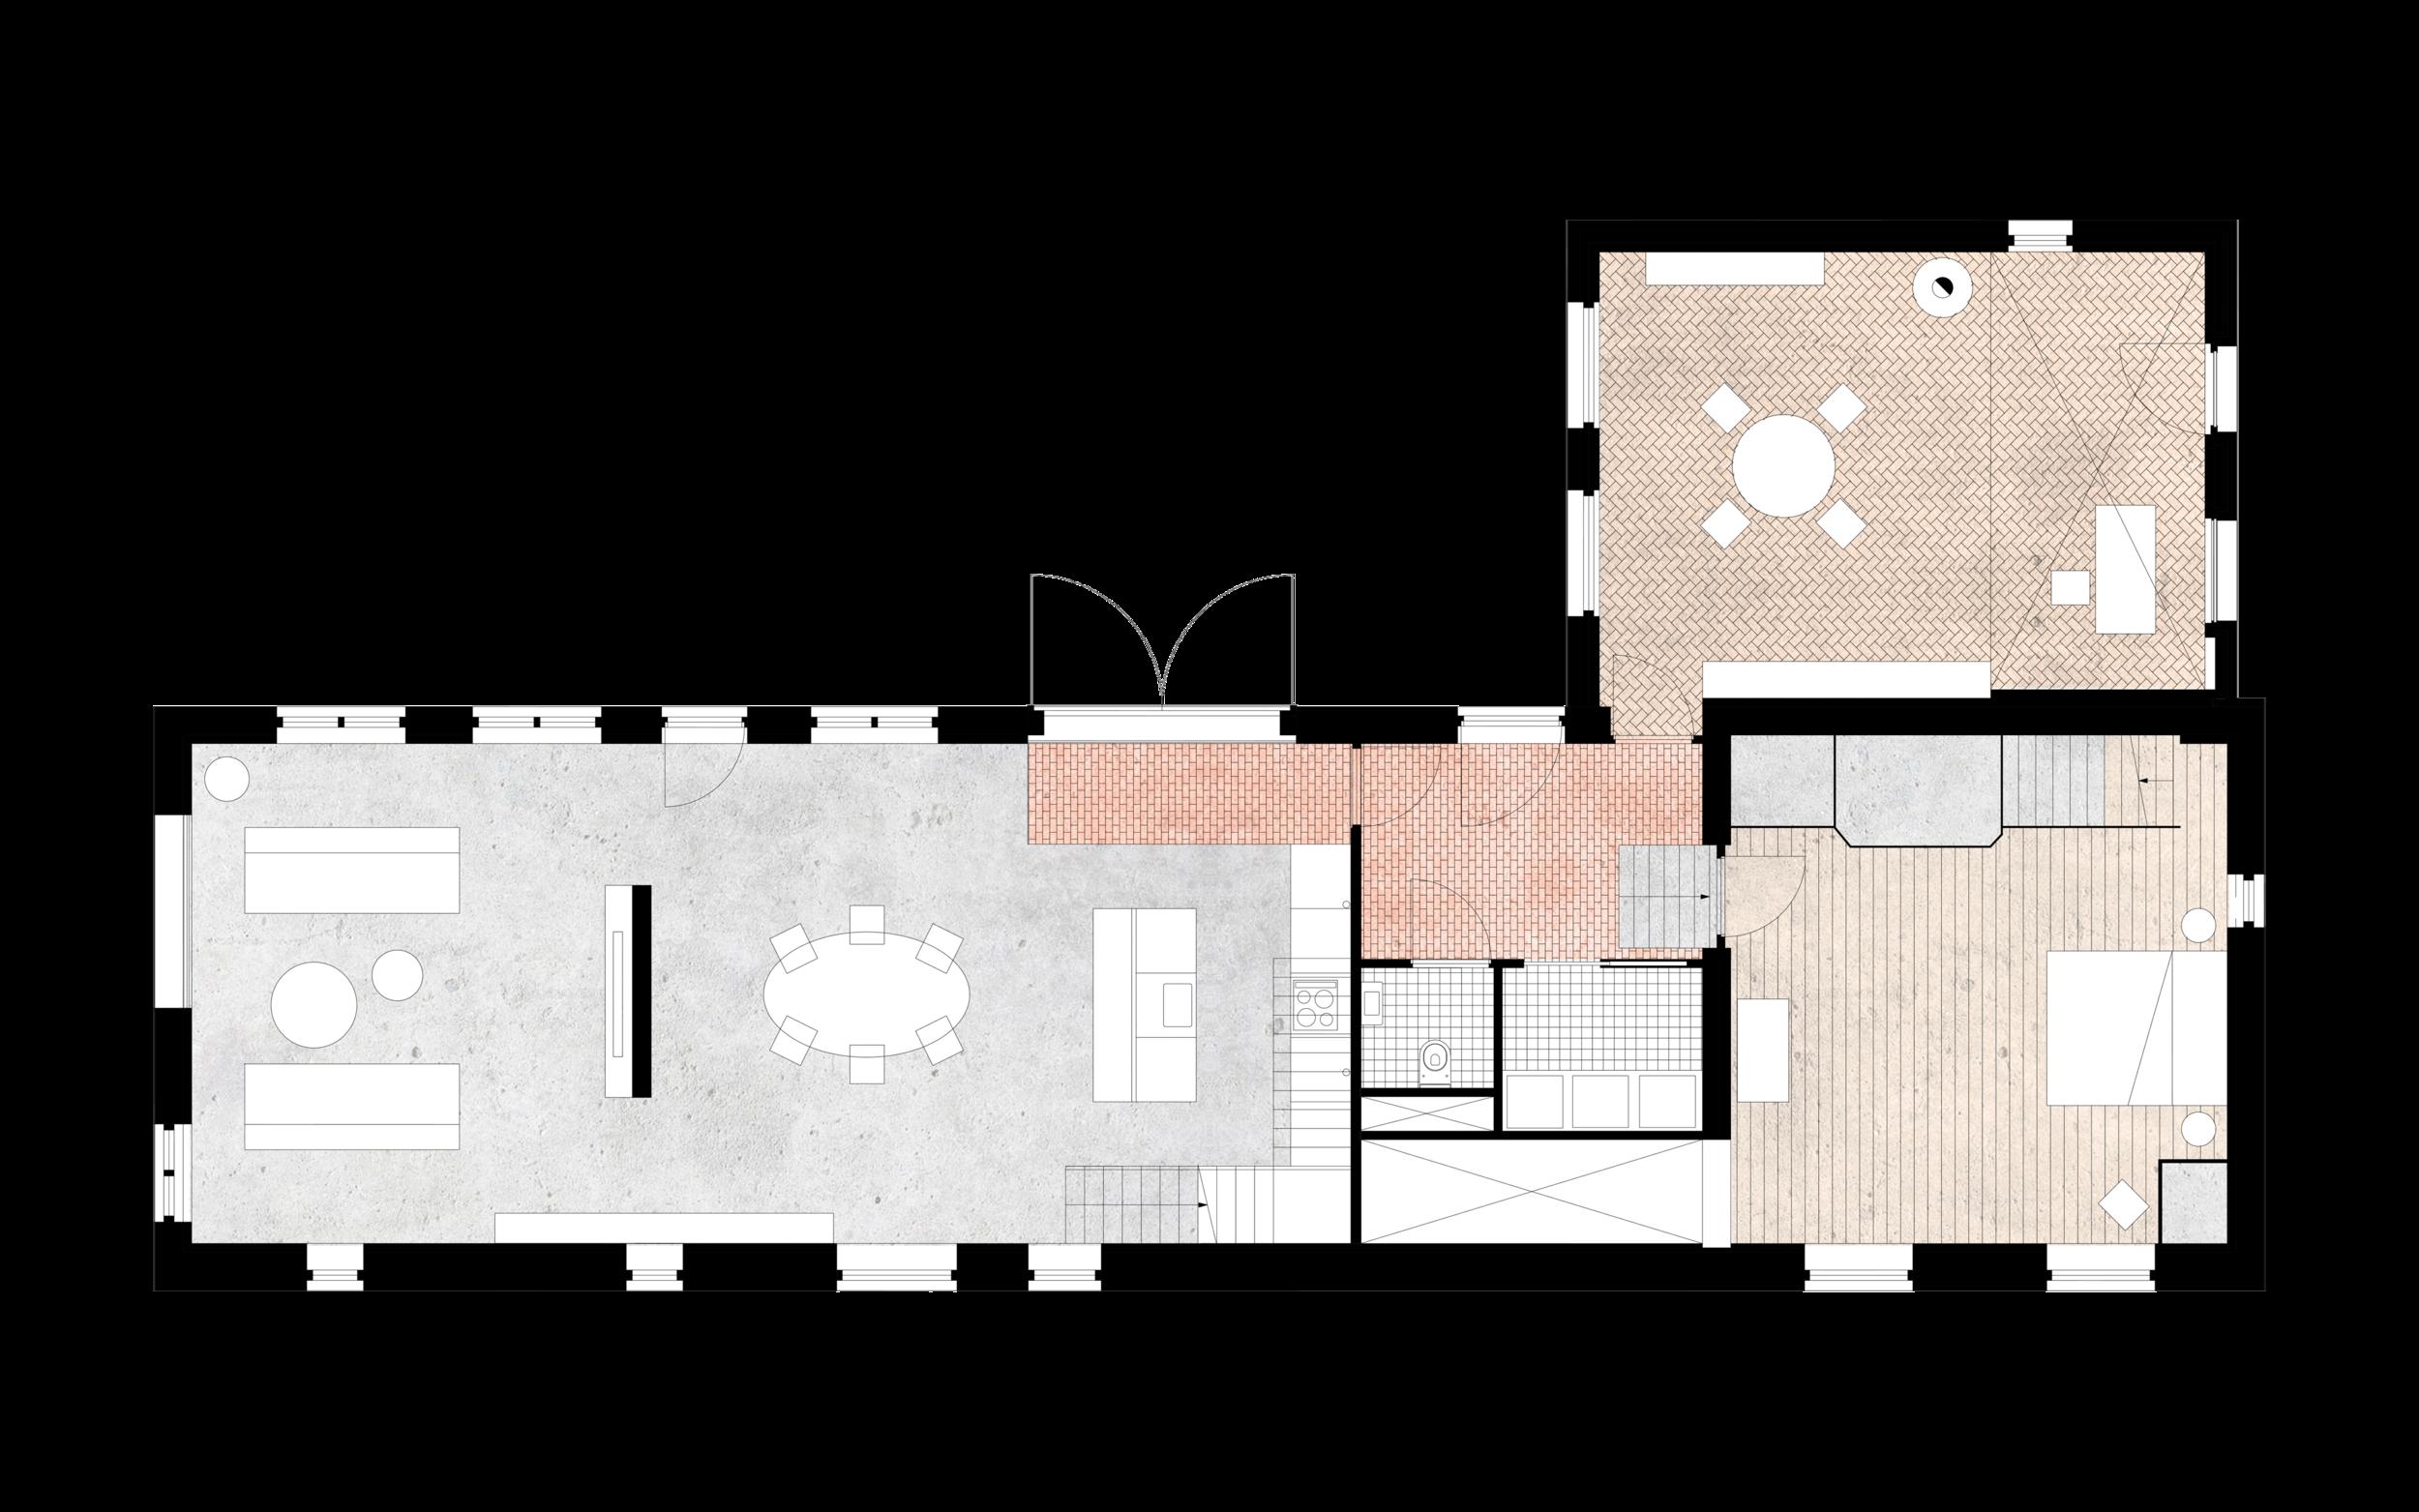 Koetshuis woning plattegrond na renovatie